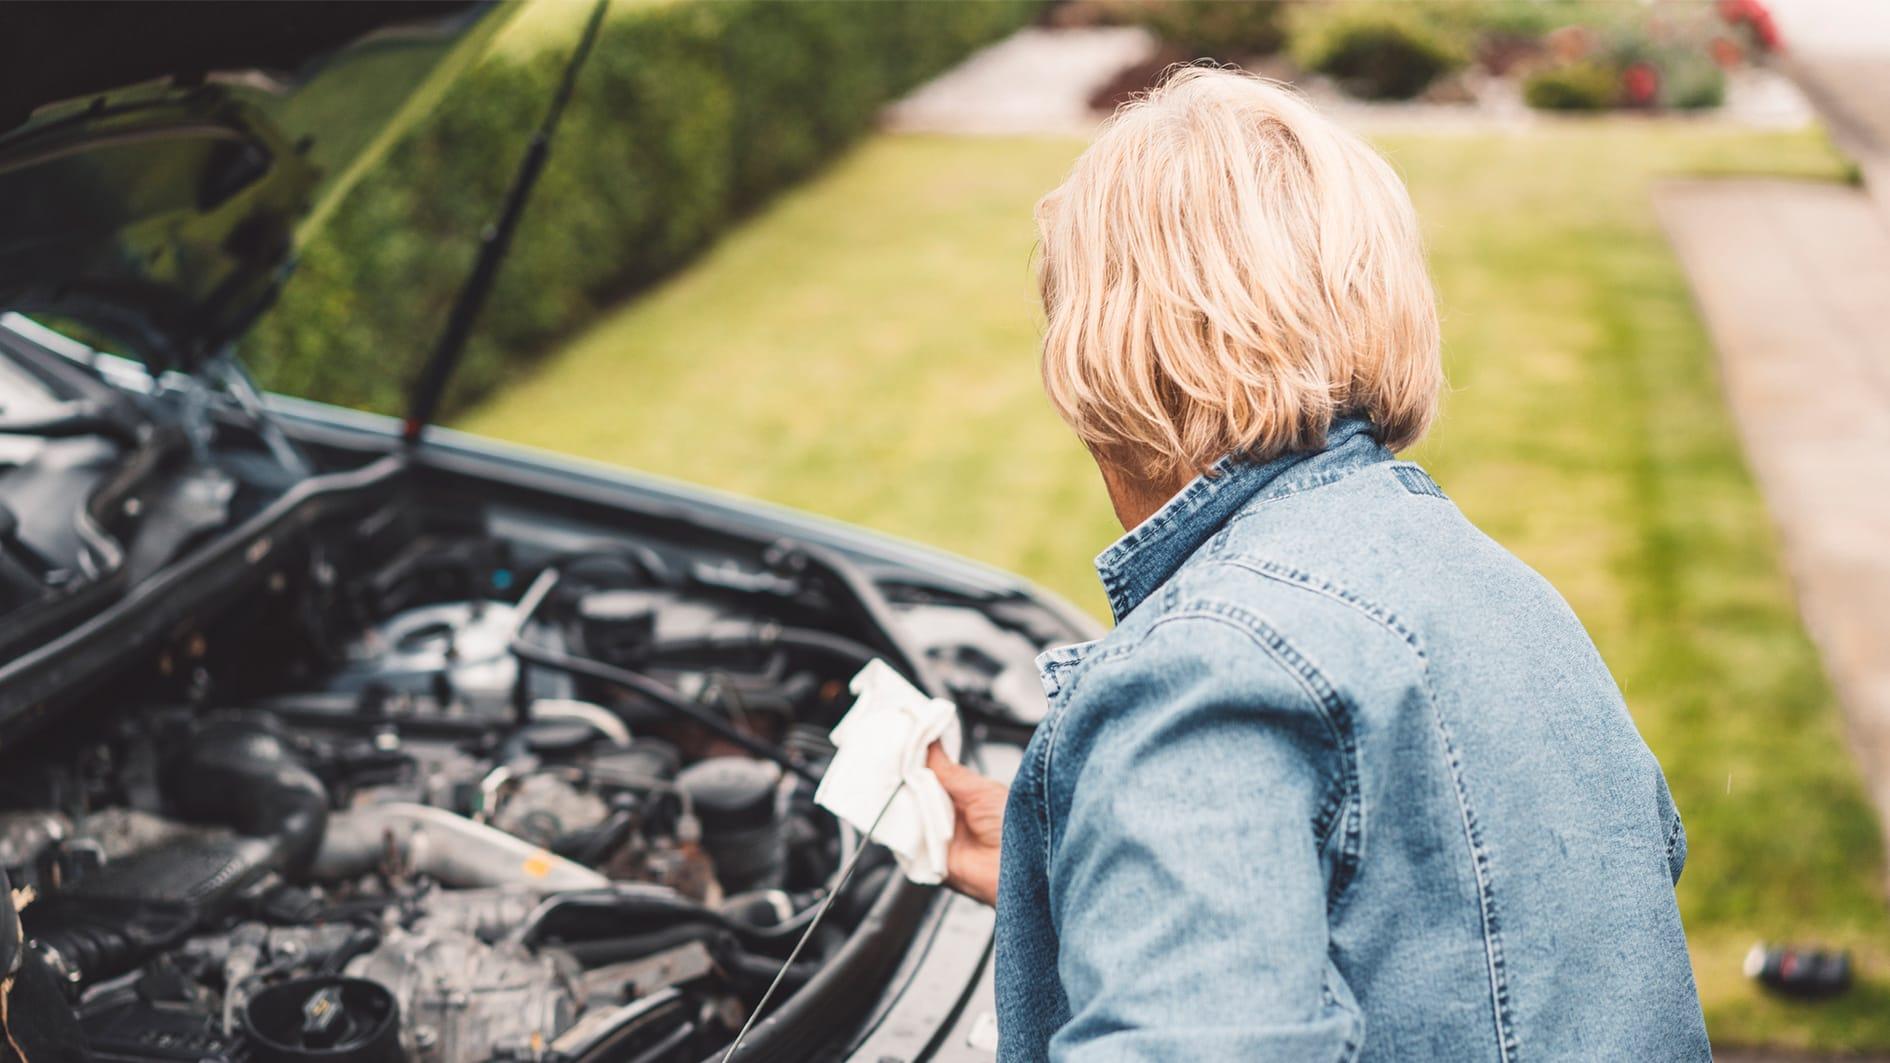 Post-coronavirus car care: 14 checks you should do before a road trip